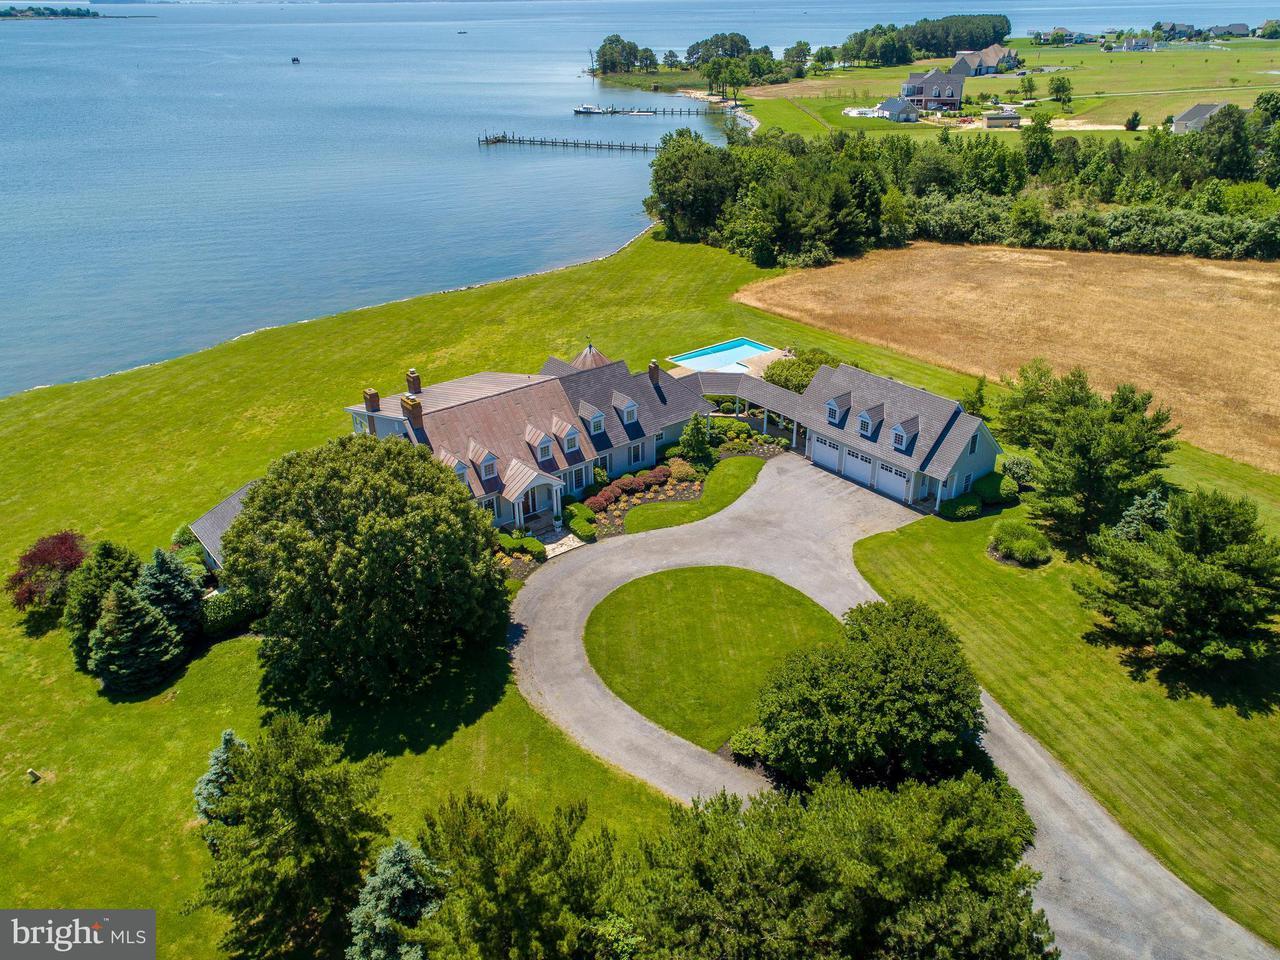 Single Family Home for Sale at 205 FANTASY Lane 205 FANTASY Lane Stevensville, Maryland 21666 United States